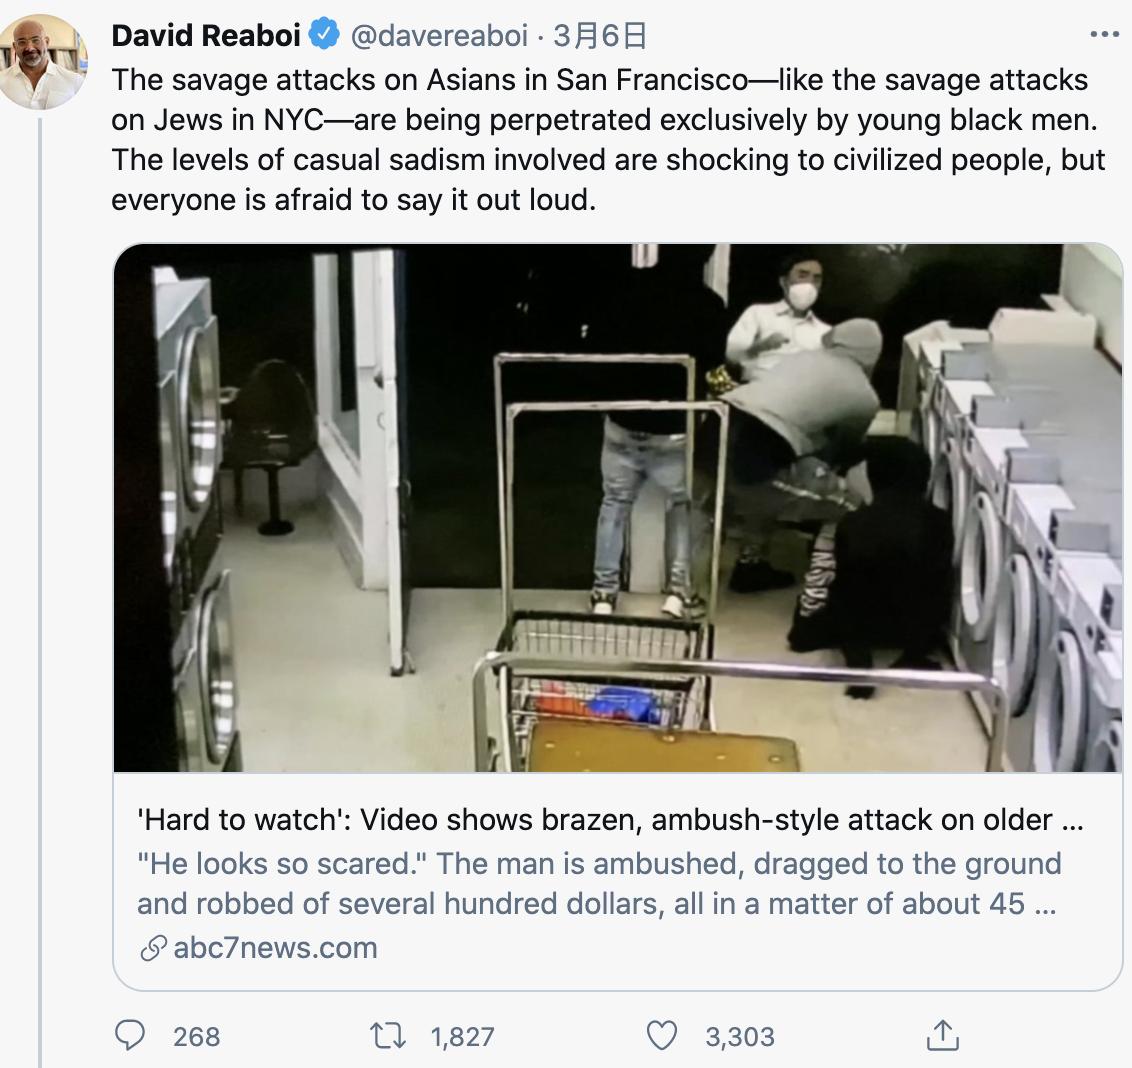 David Reaboi推文翻譯:三藩市發生的對亞裔的野蠻攻擊就像紐約市對猶太人的野蠻攻擊一樣,完全是由黑人青年實施的。其中涉及的隨意虐殺程度令文明人震驚,但大家都不敢大聲說出來。(推文截圖)